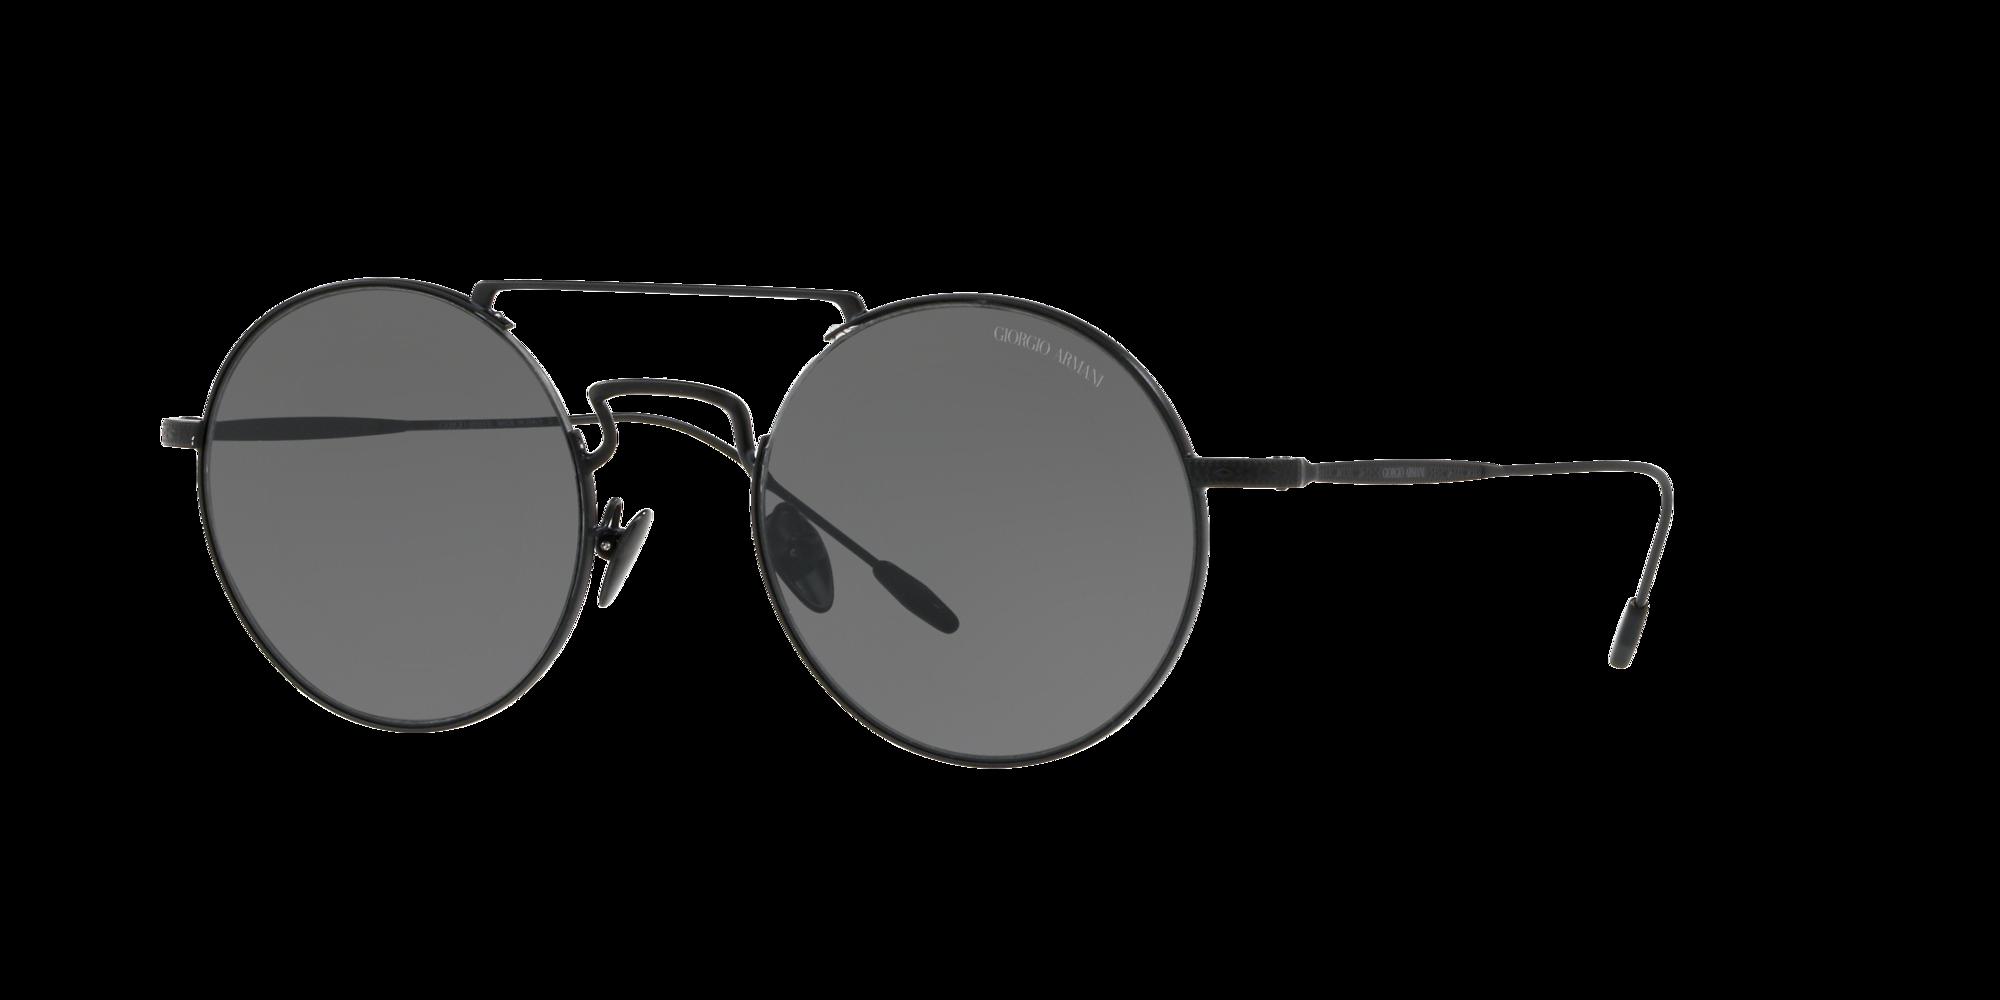 giorgio armani sunglasses 2018